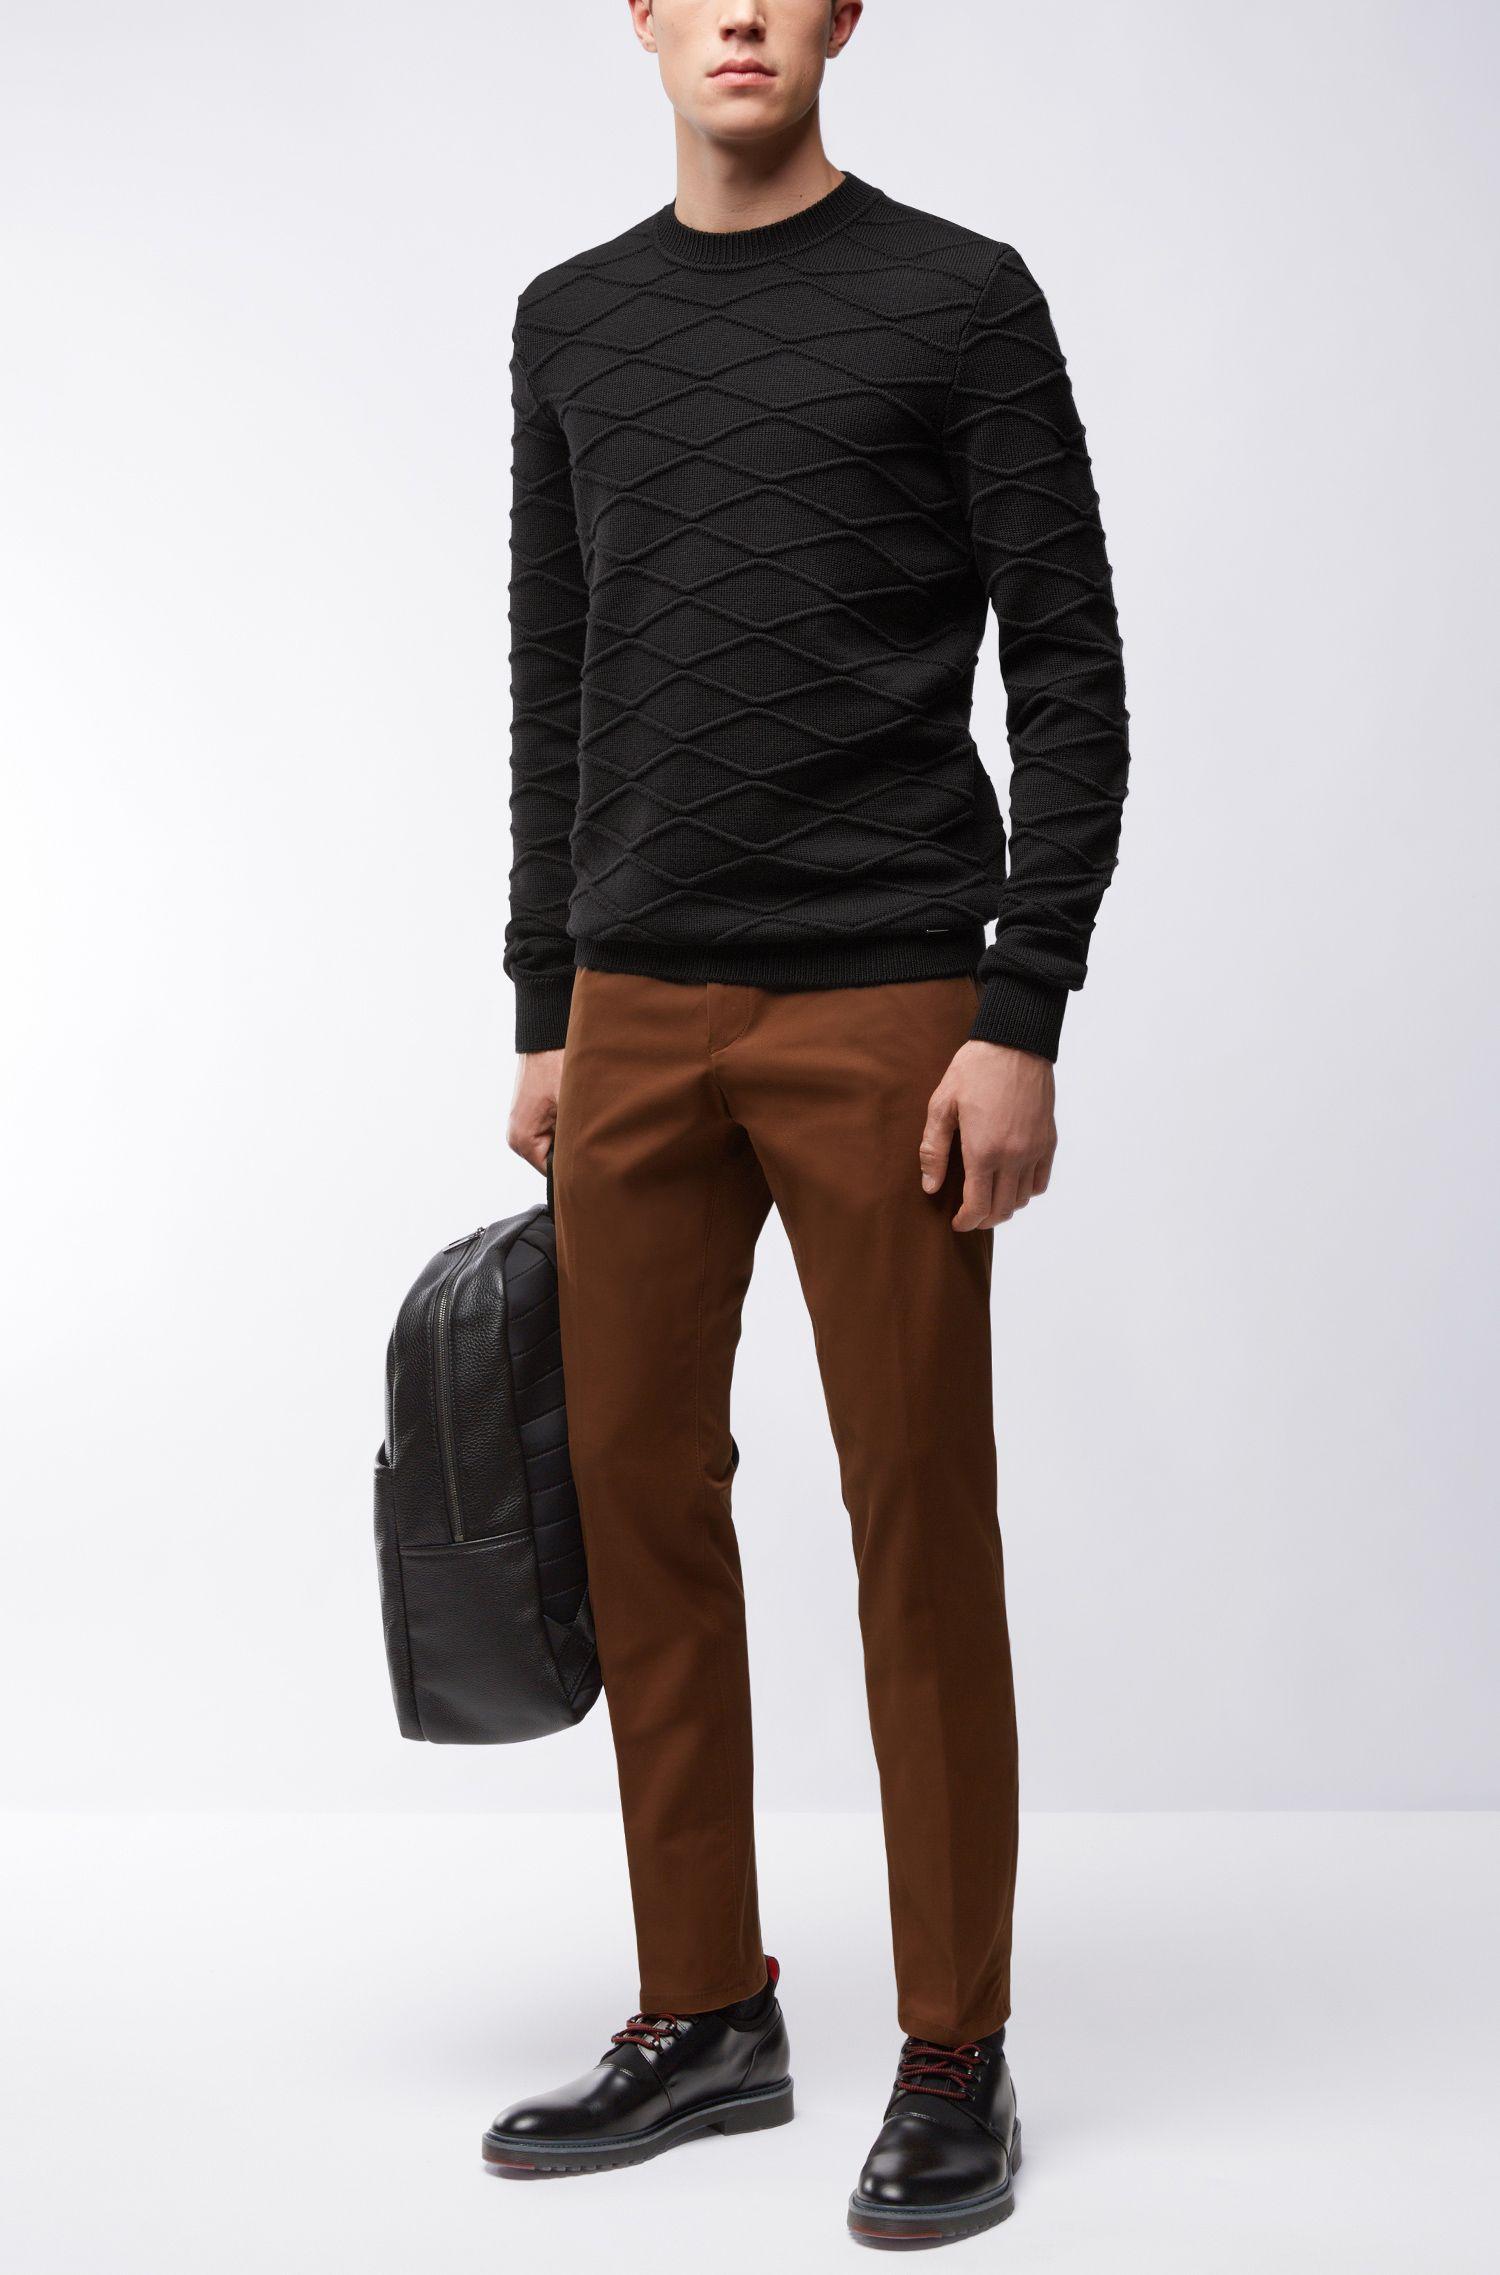 Virgin Wool Sweater | Svave